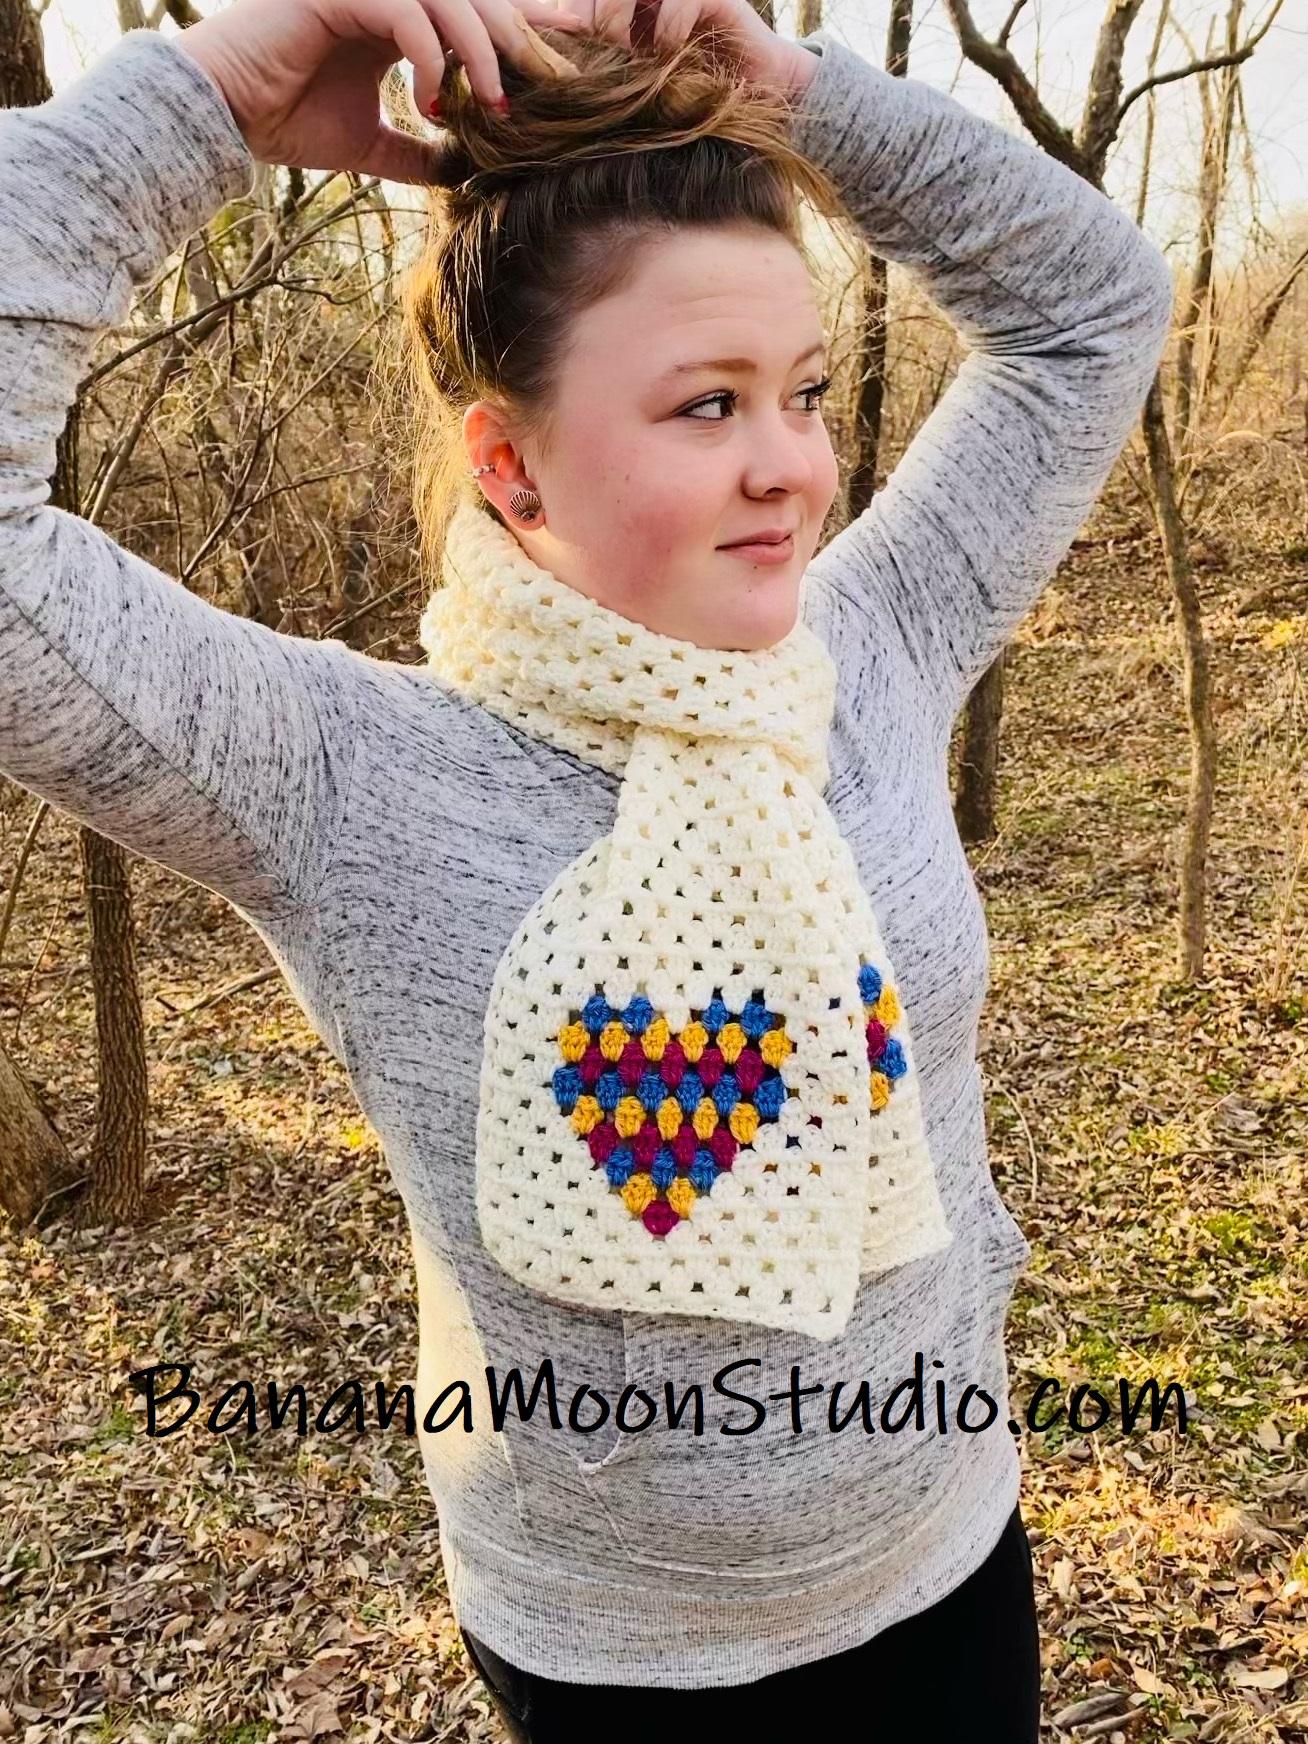 Valentine crochet patterns free, from Banana Moon Studio